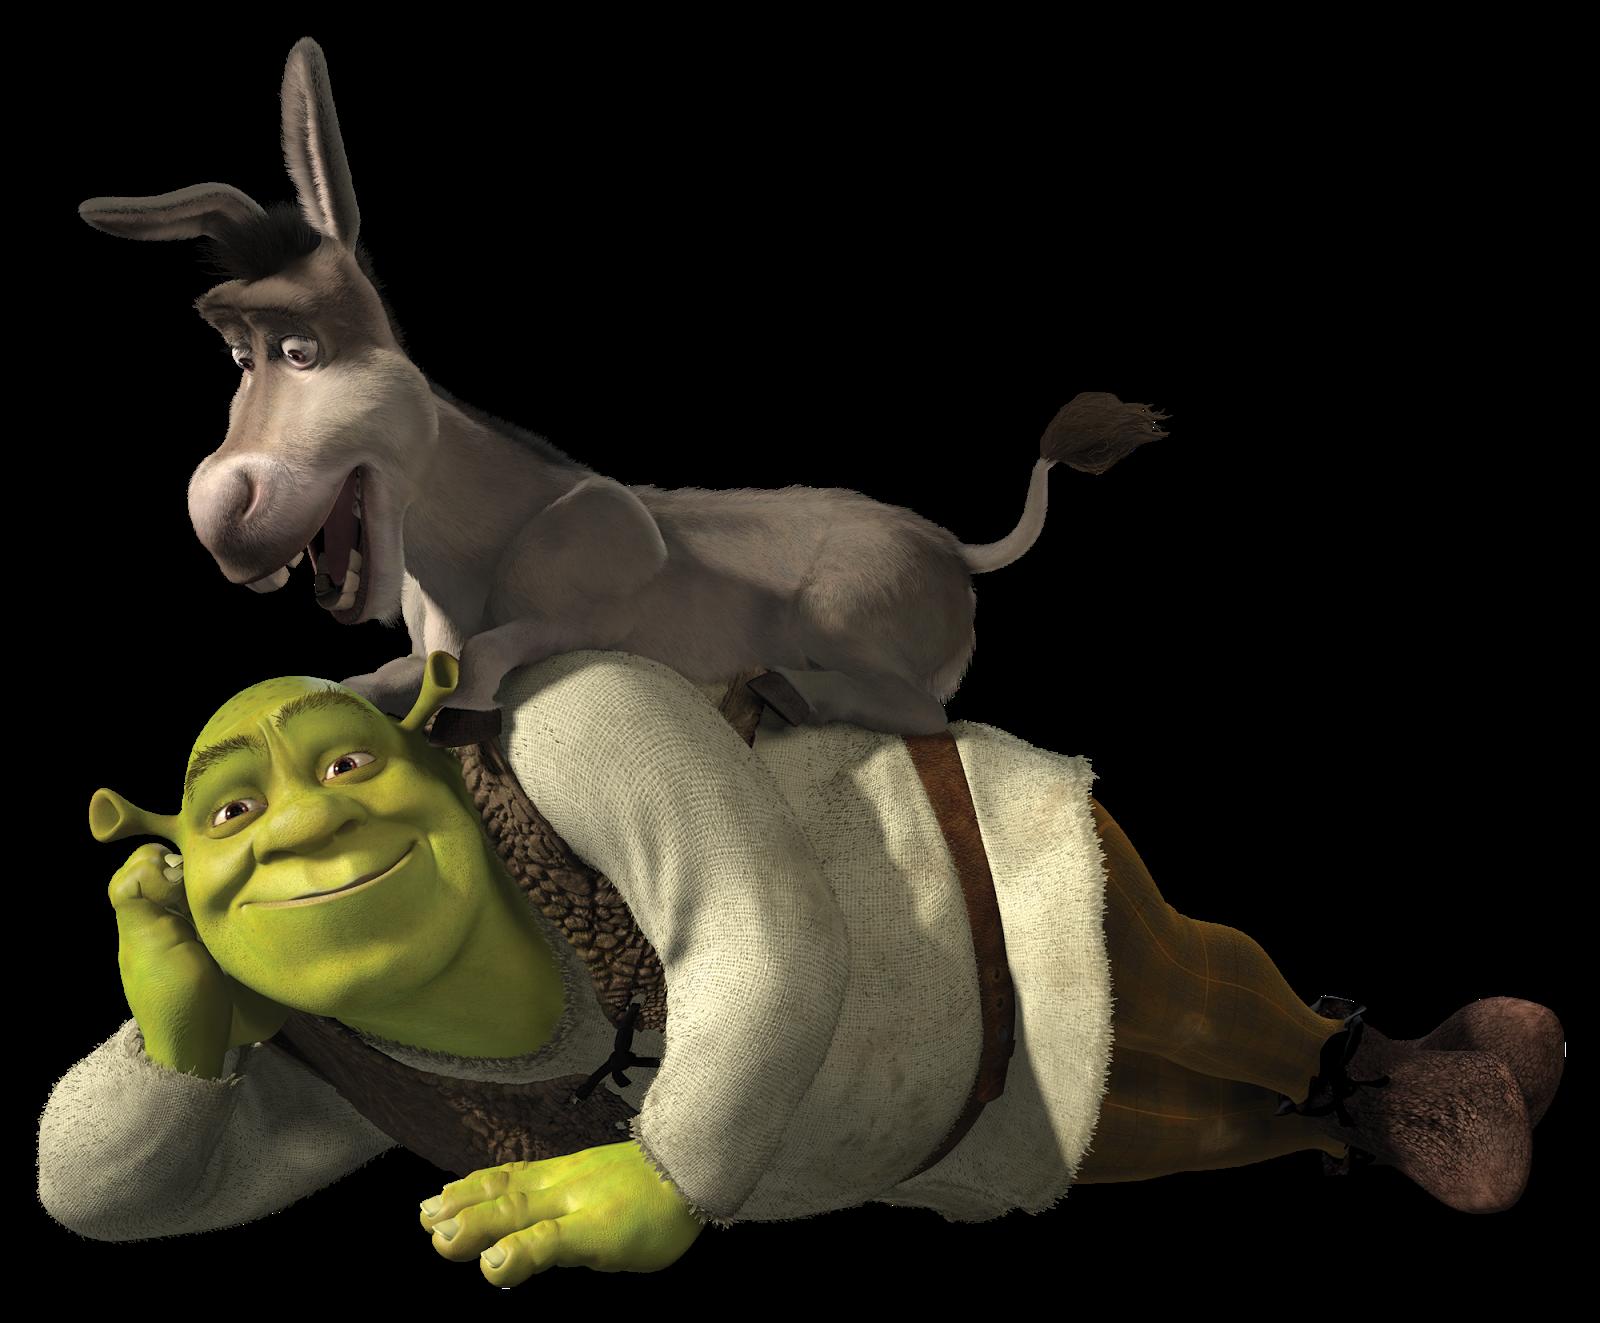 Png image purepng free. Donkey clipart shrek character